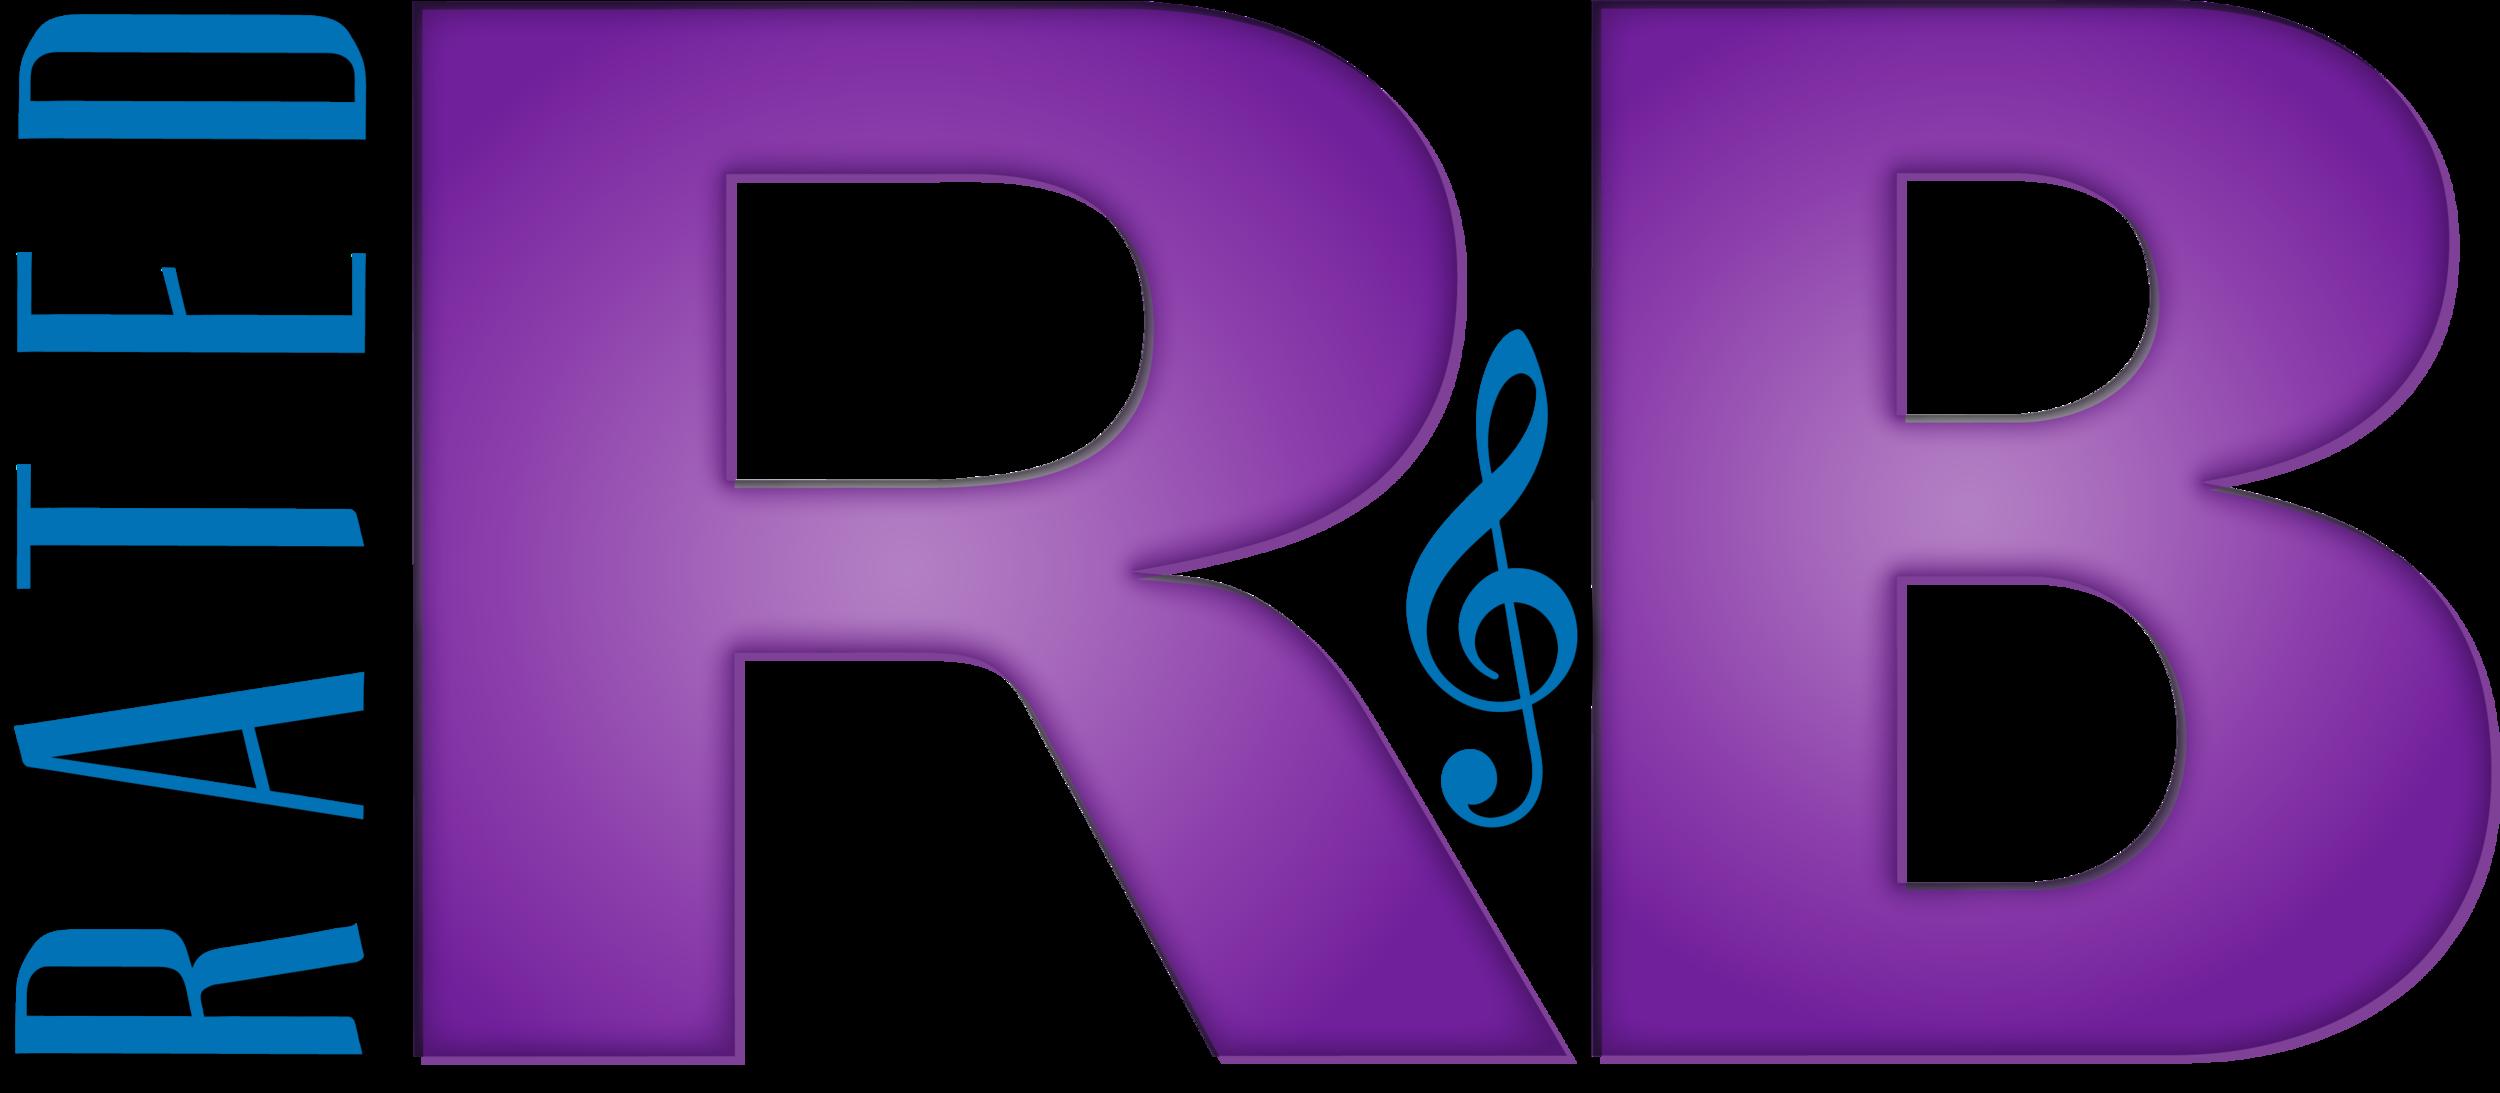 tumblr_static_rated_r_b_logo_design-01.png